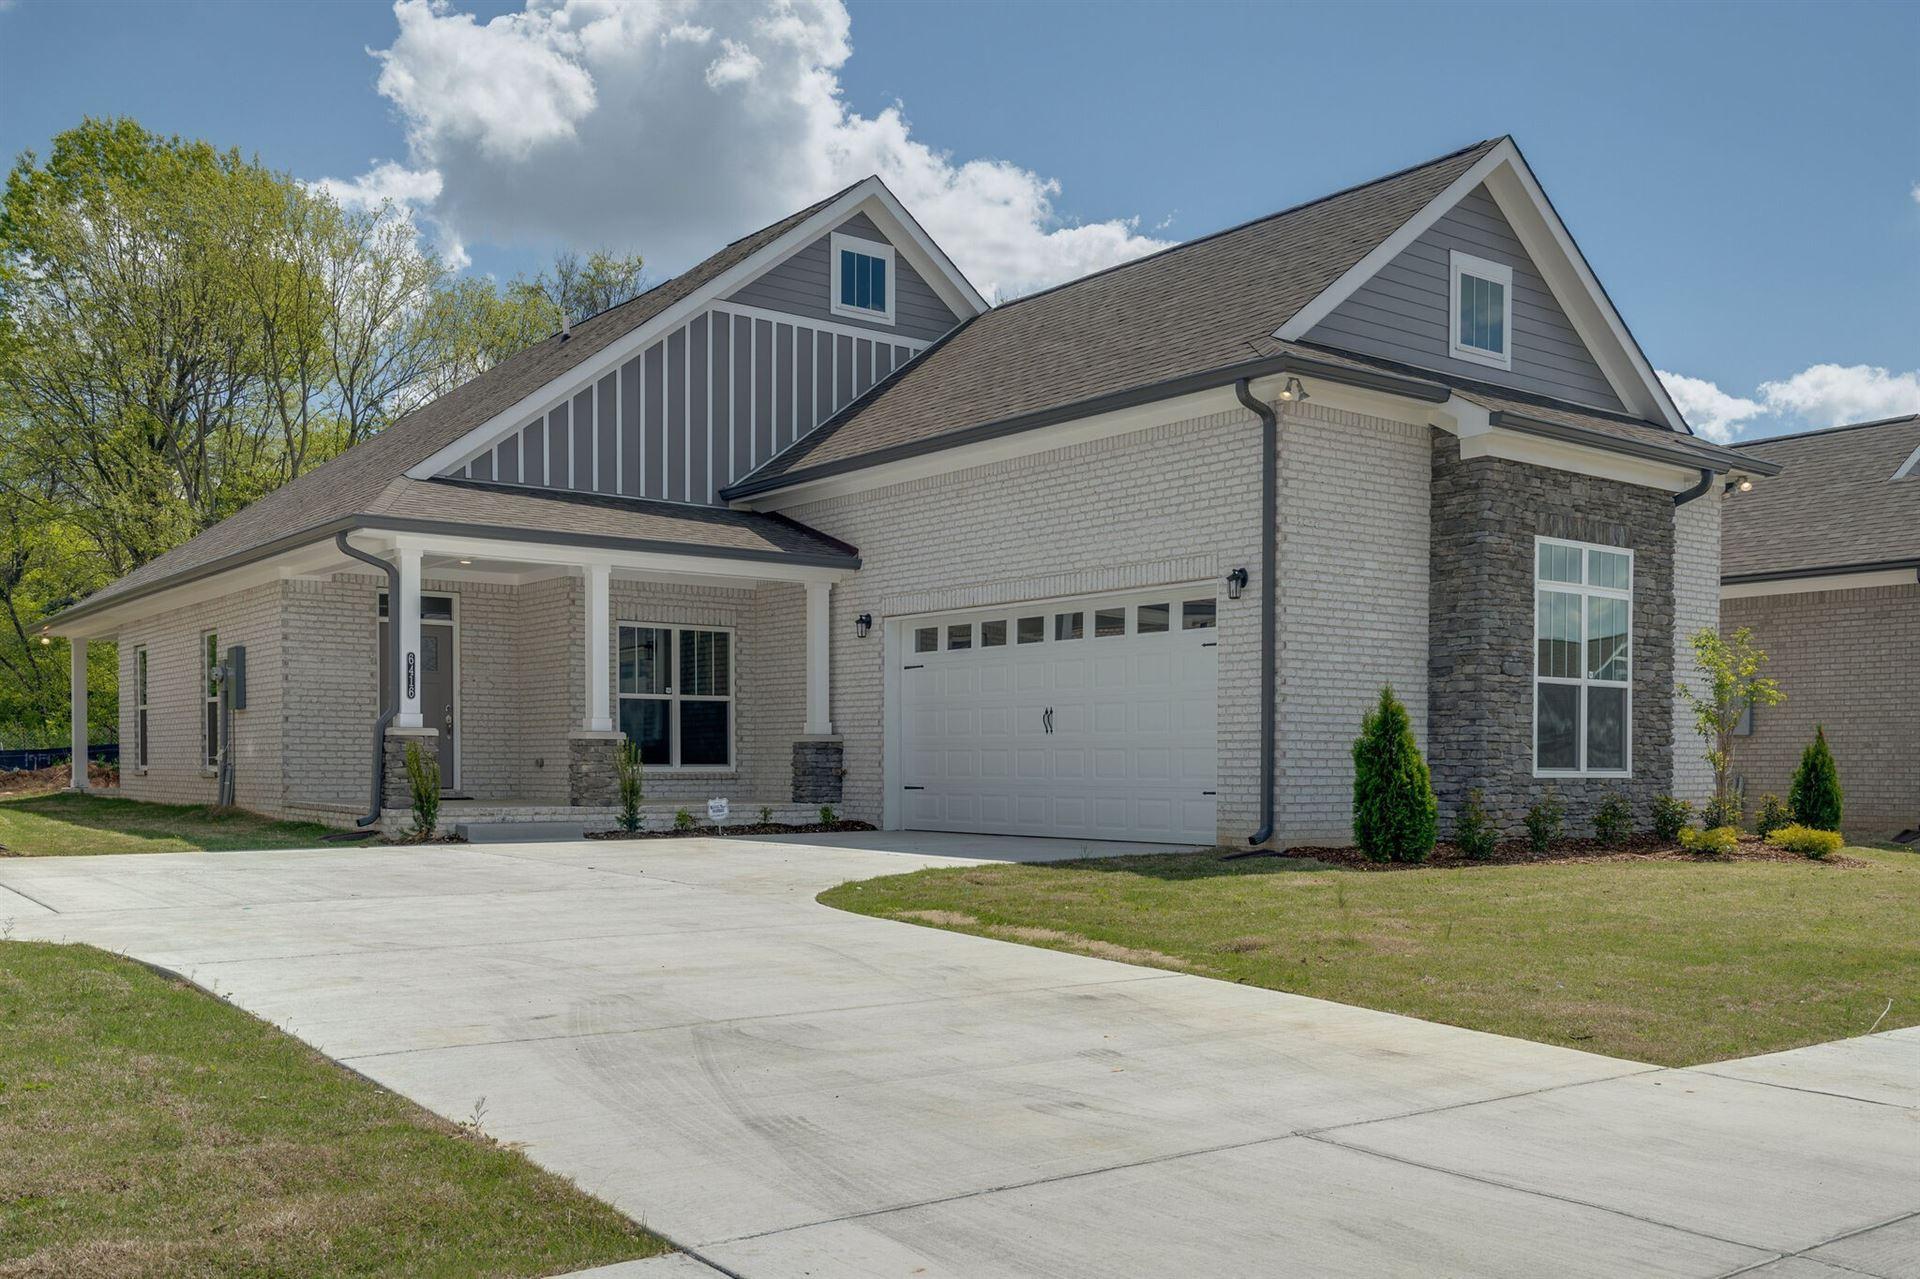 6561 Frye Lane, Hermitage, TN 37076 - MLS#: 2290999